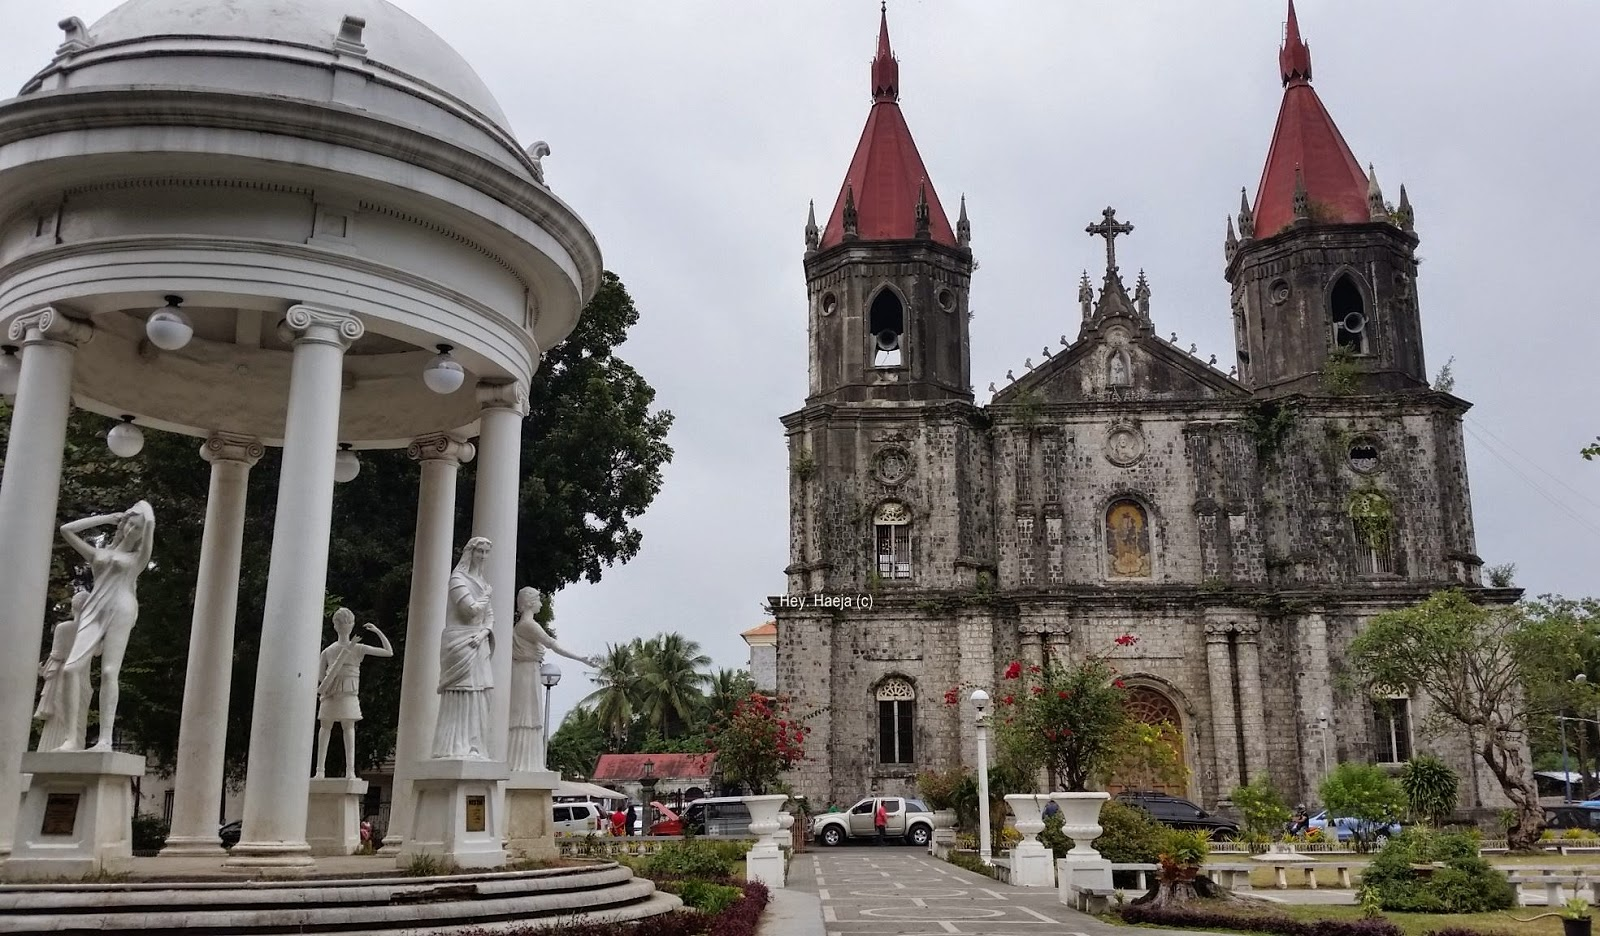 St. Anne's Church, Iloilo | (c) Hey, Haeja